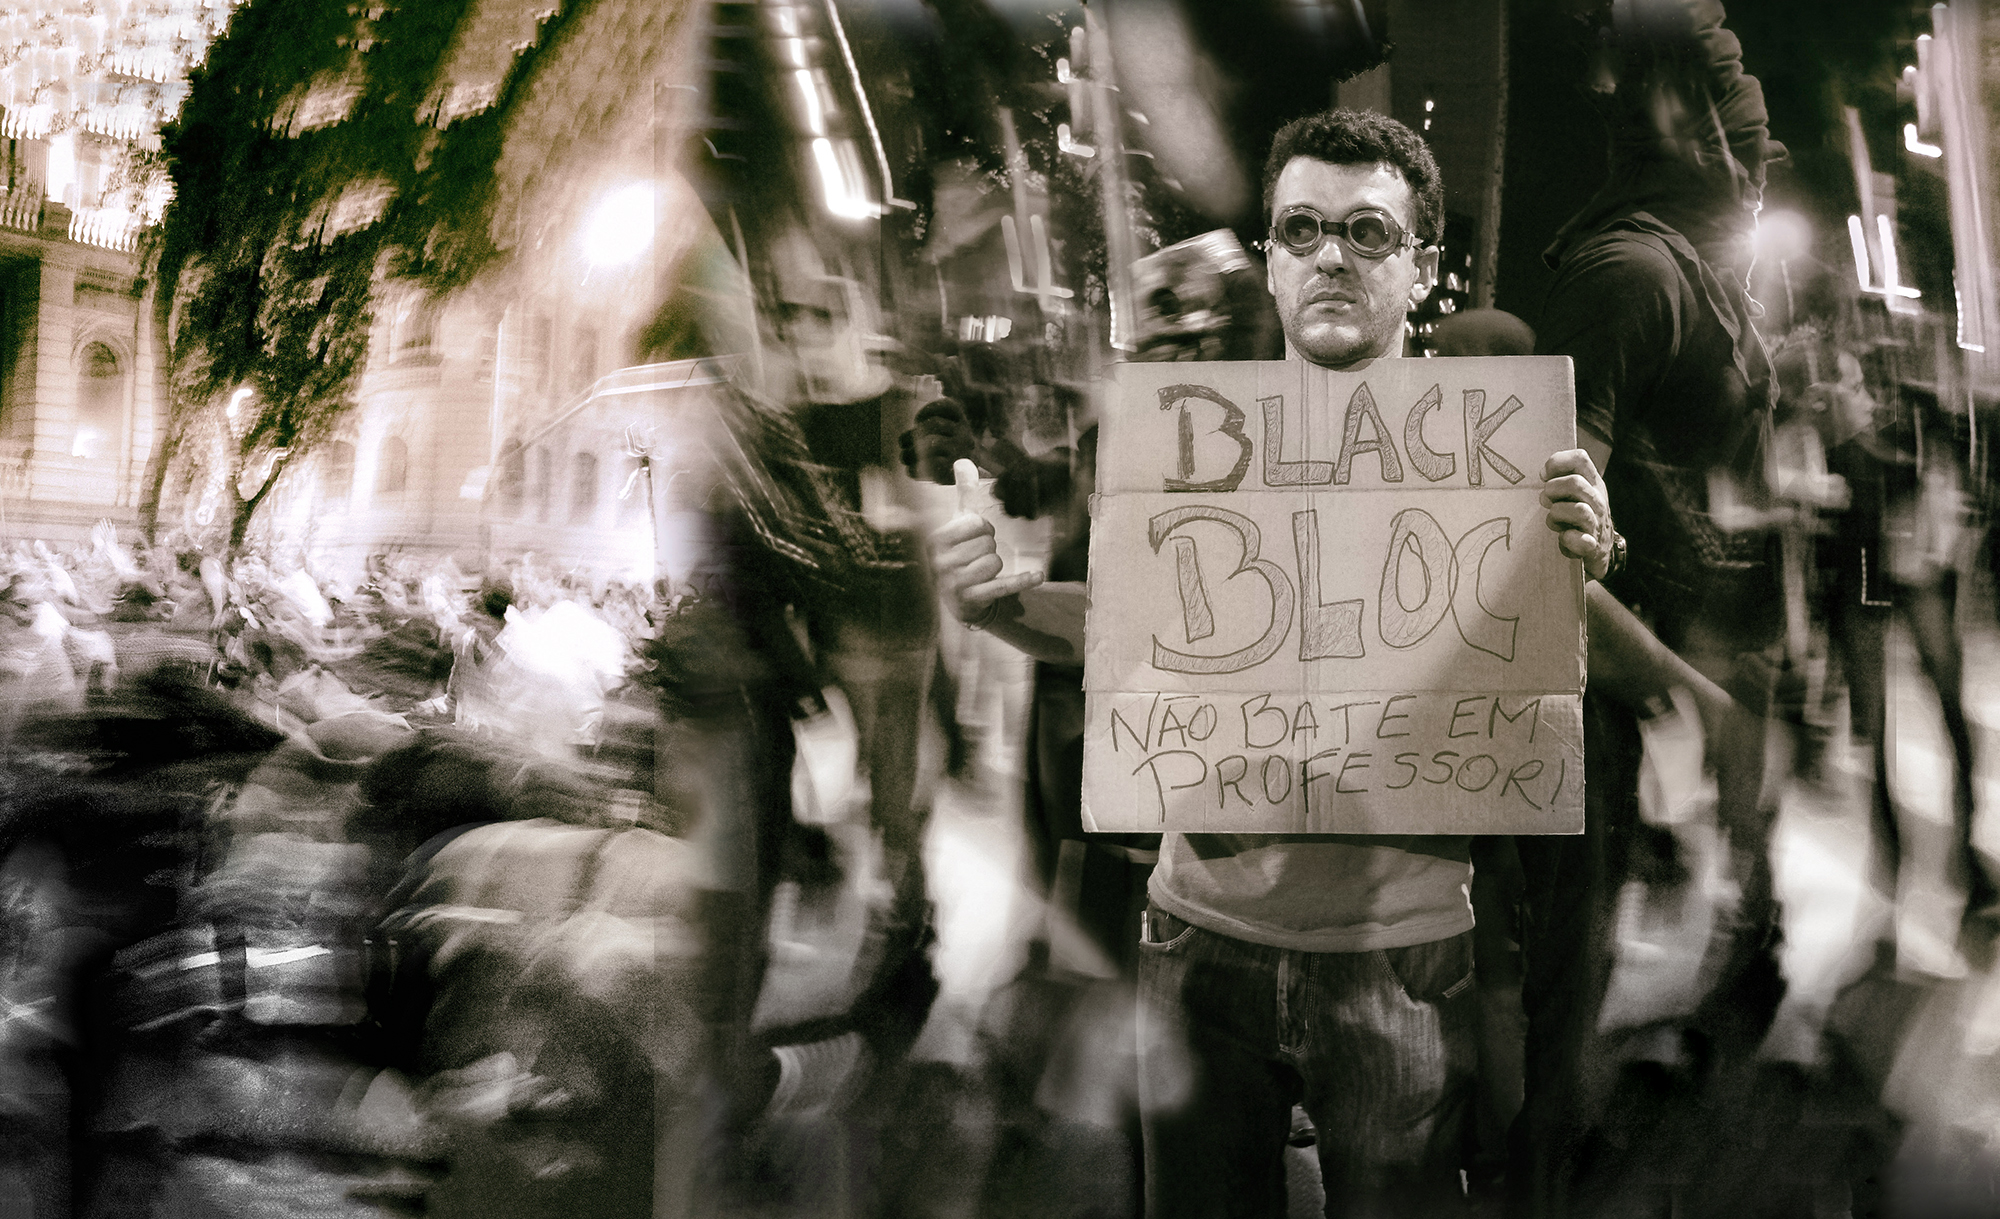 Fotos: Luiz Baltar